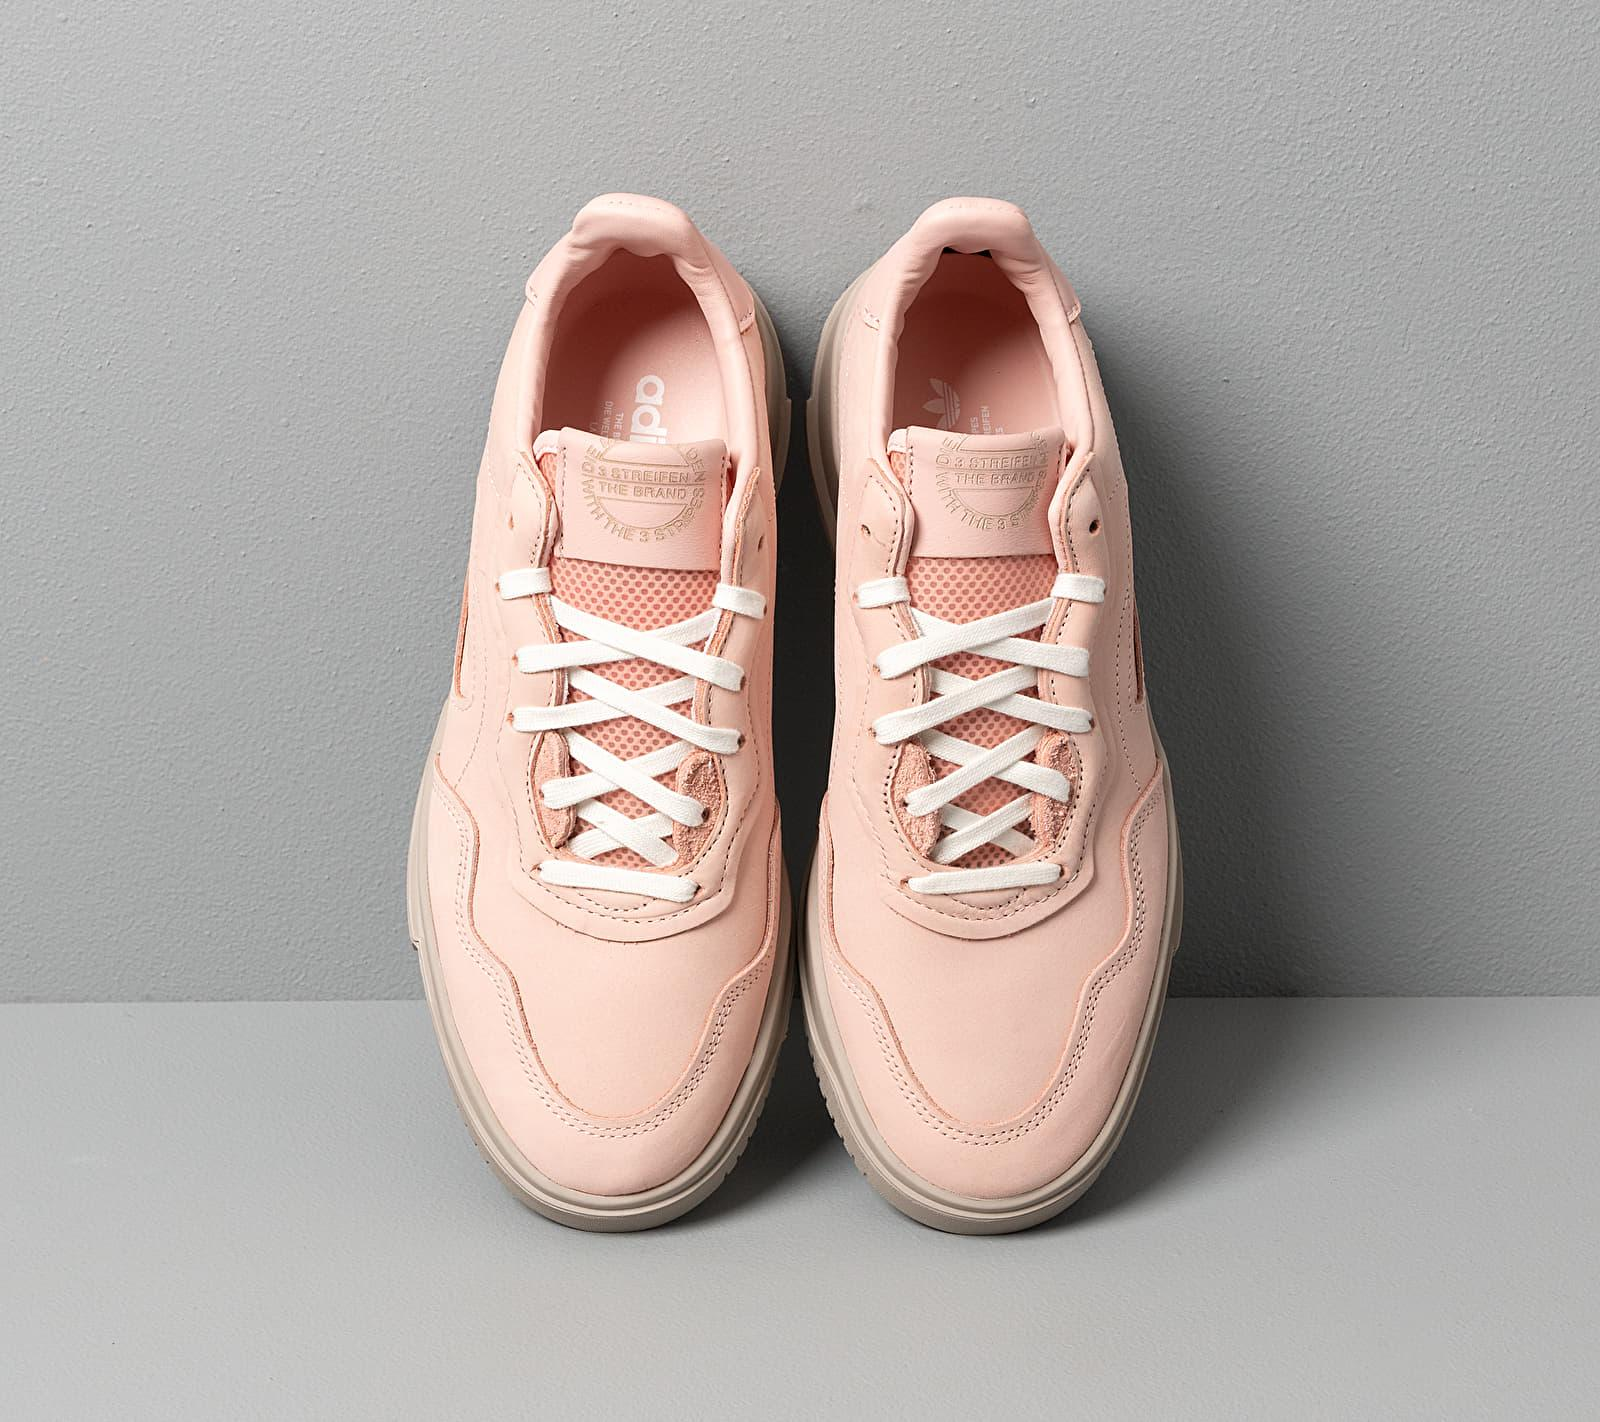 Adidas Sc Premiere W Vapor Pink/ Vapor Pink/ Light Brown adidas Originals